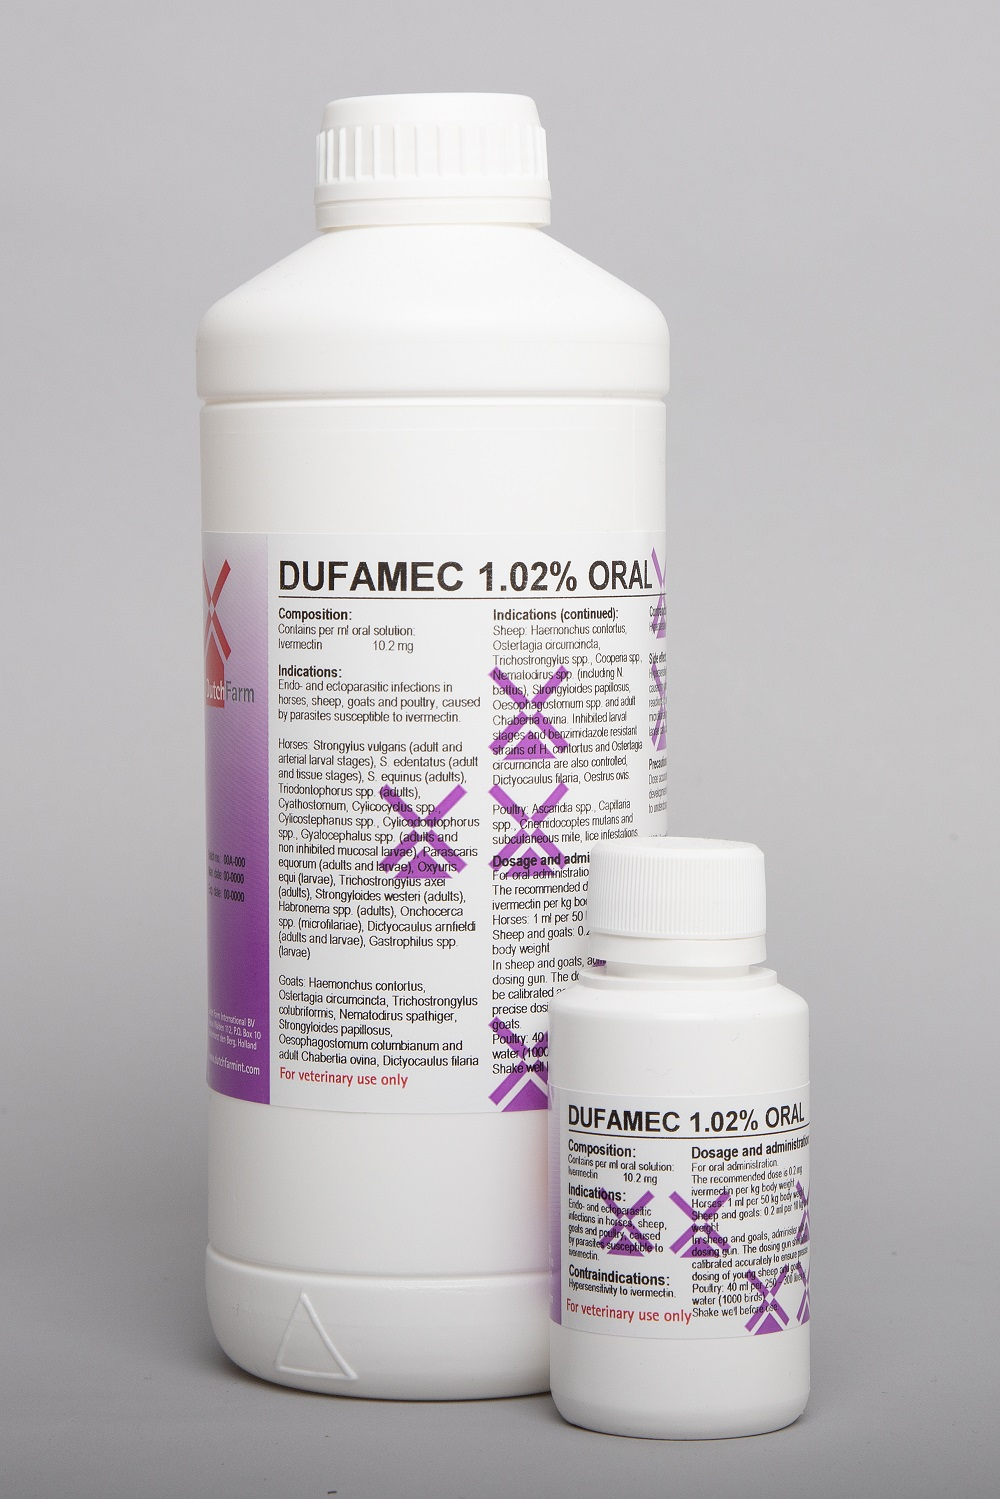 Dufamec 1.02% Oral